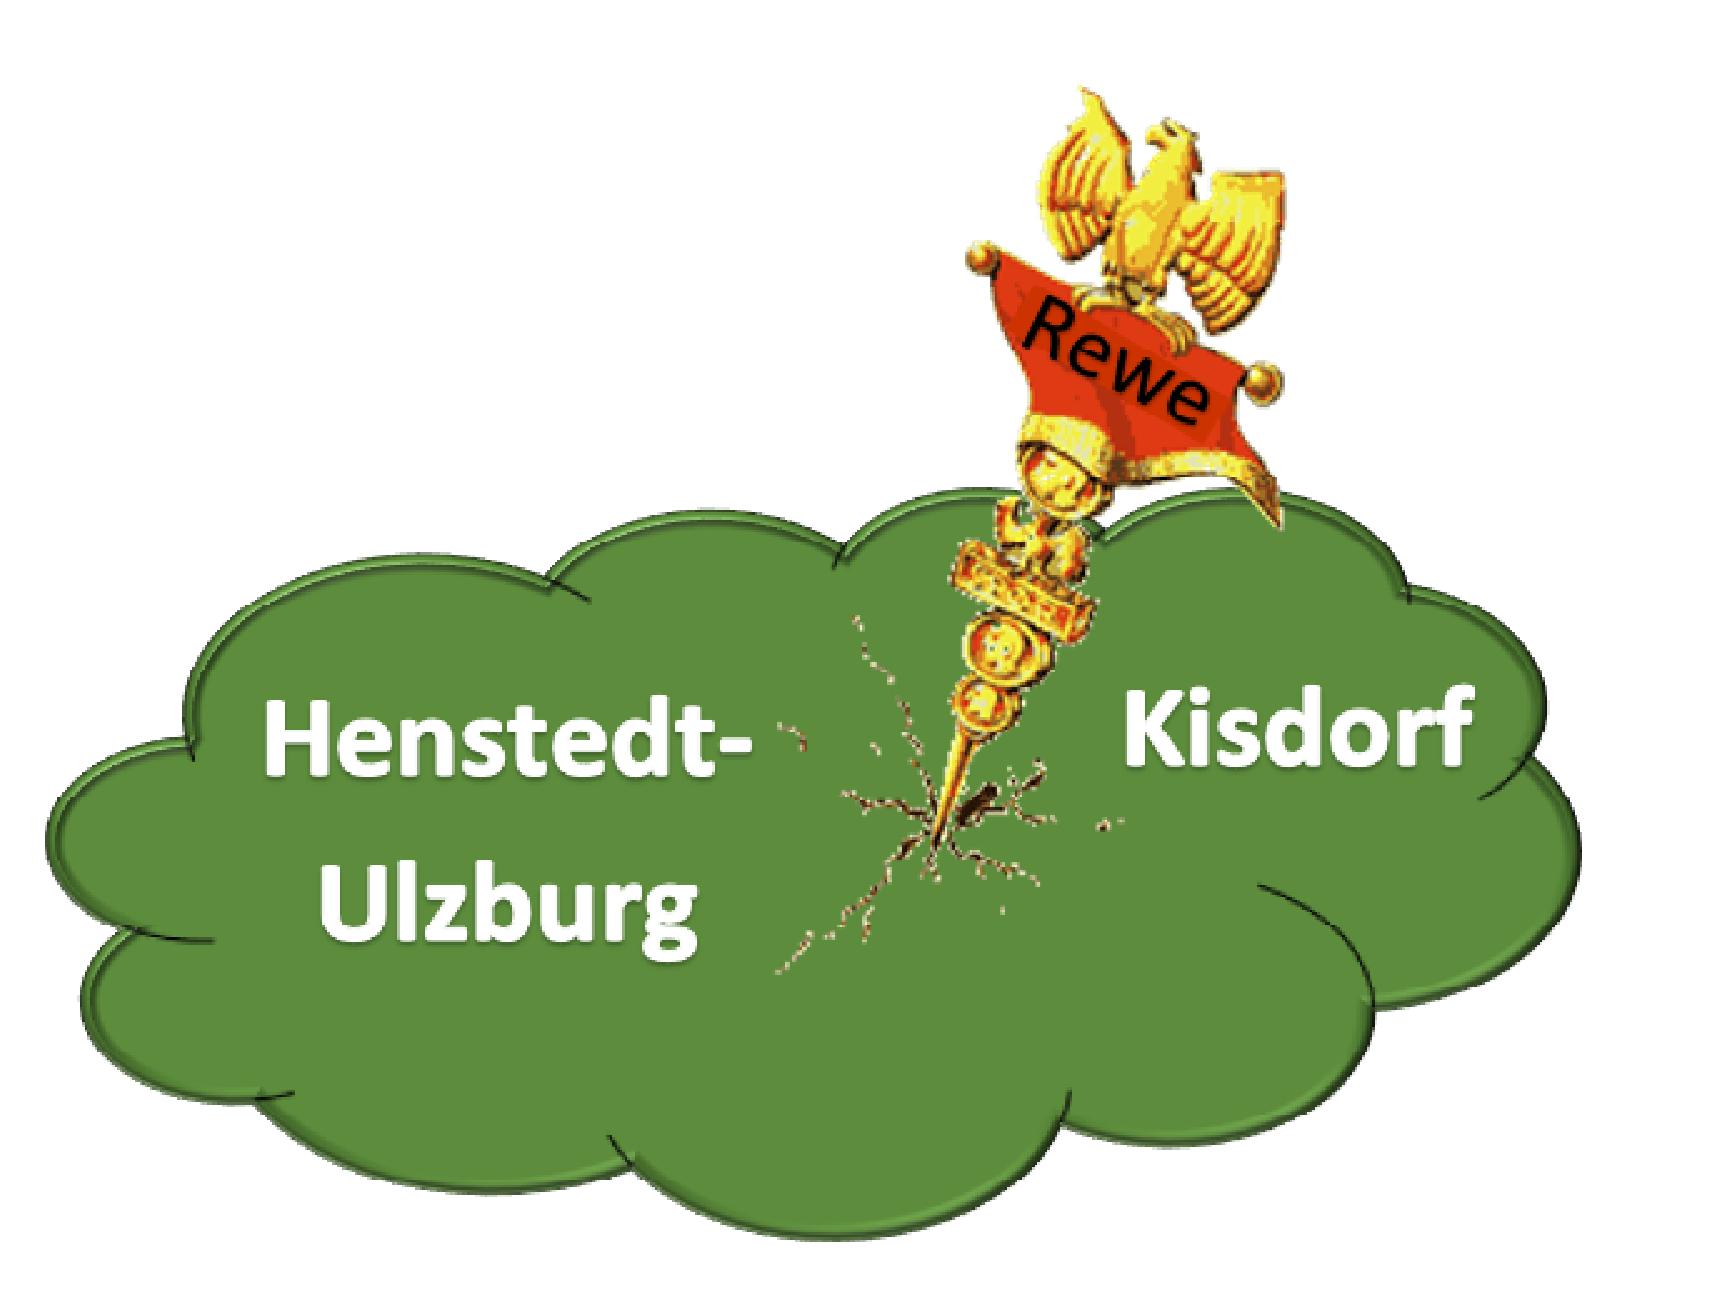 rewe plant mit robotern kisdorf henstedt ulzburg verh lt sich wie trump henstedt ulzburger. Black Bedroom Furniture Sets. Home Design Ideas